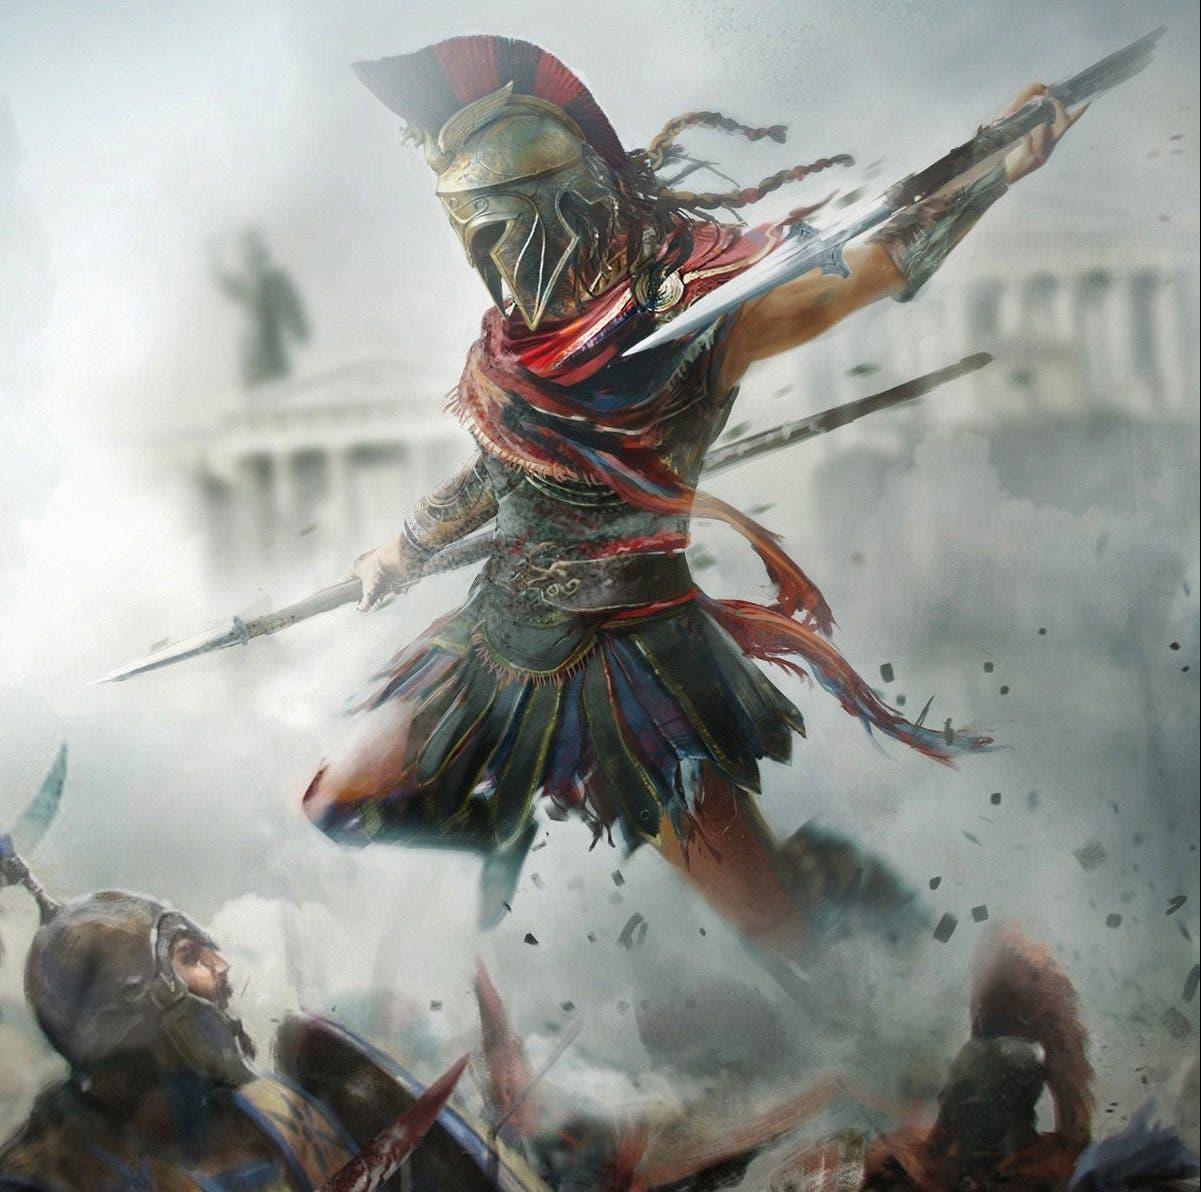 artes conceptuales de Assassin's Creed Odyssey